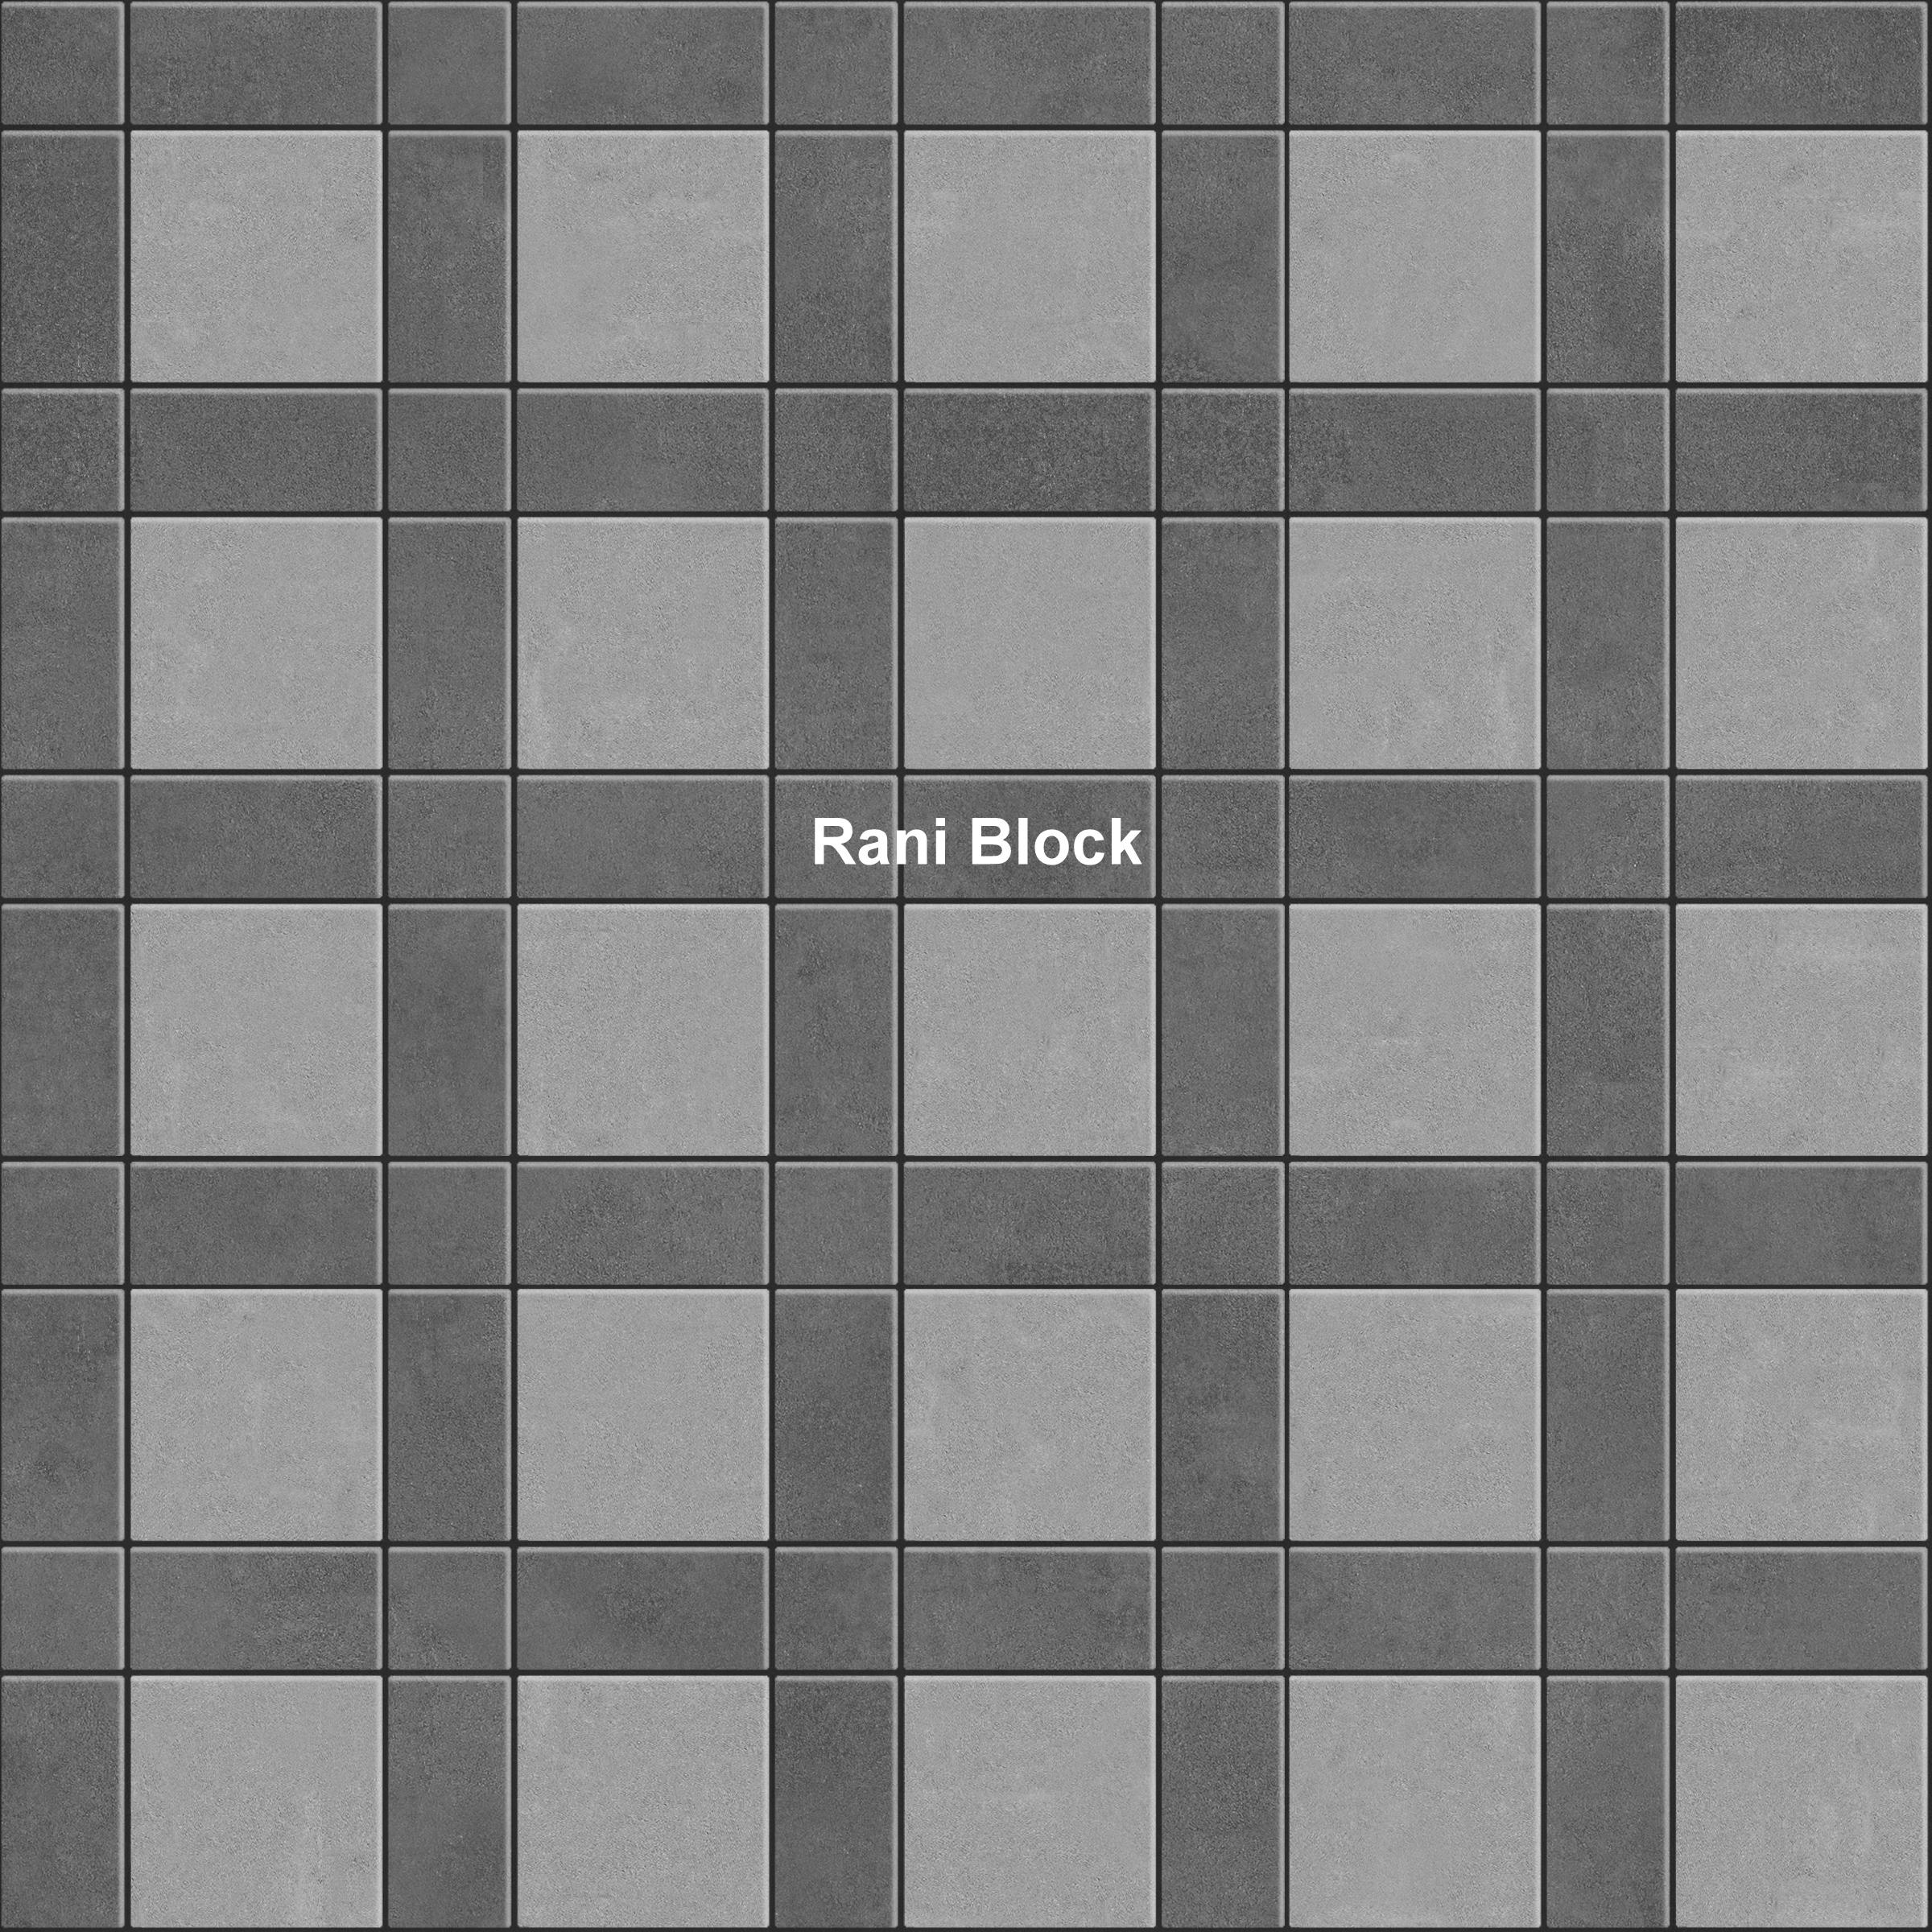 Kombinasi Paving Block Bata, Ubin dan Kubus